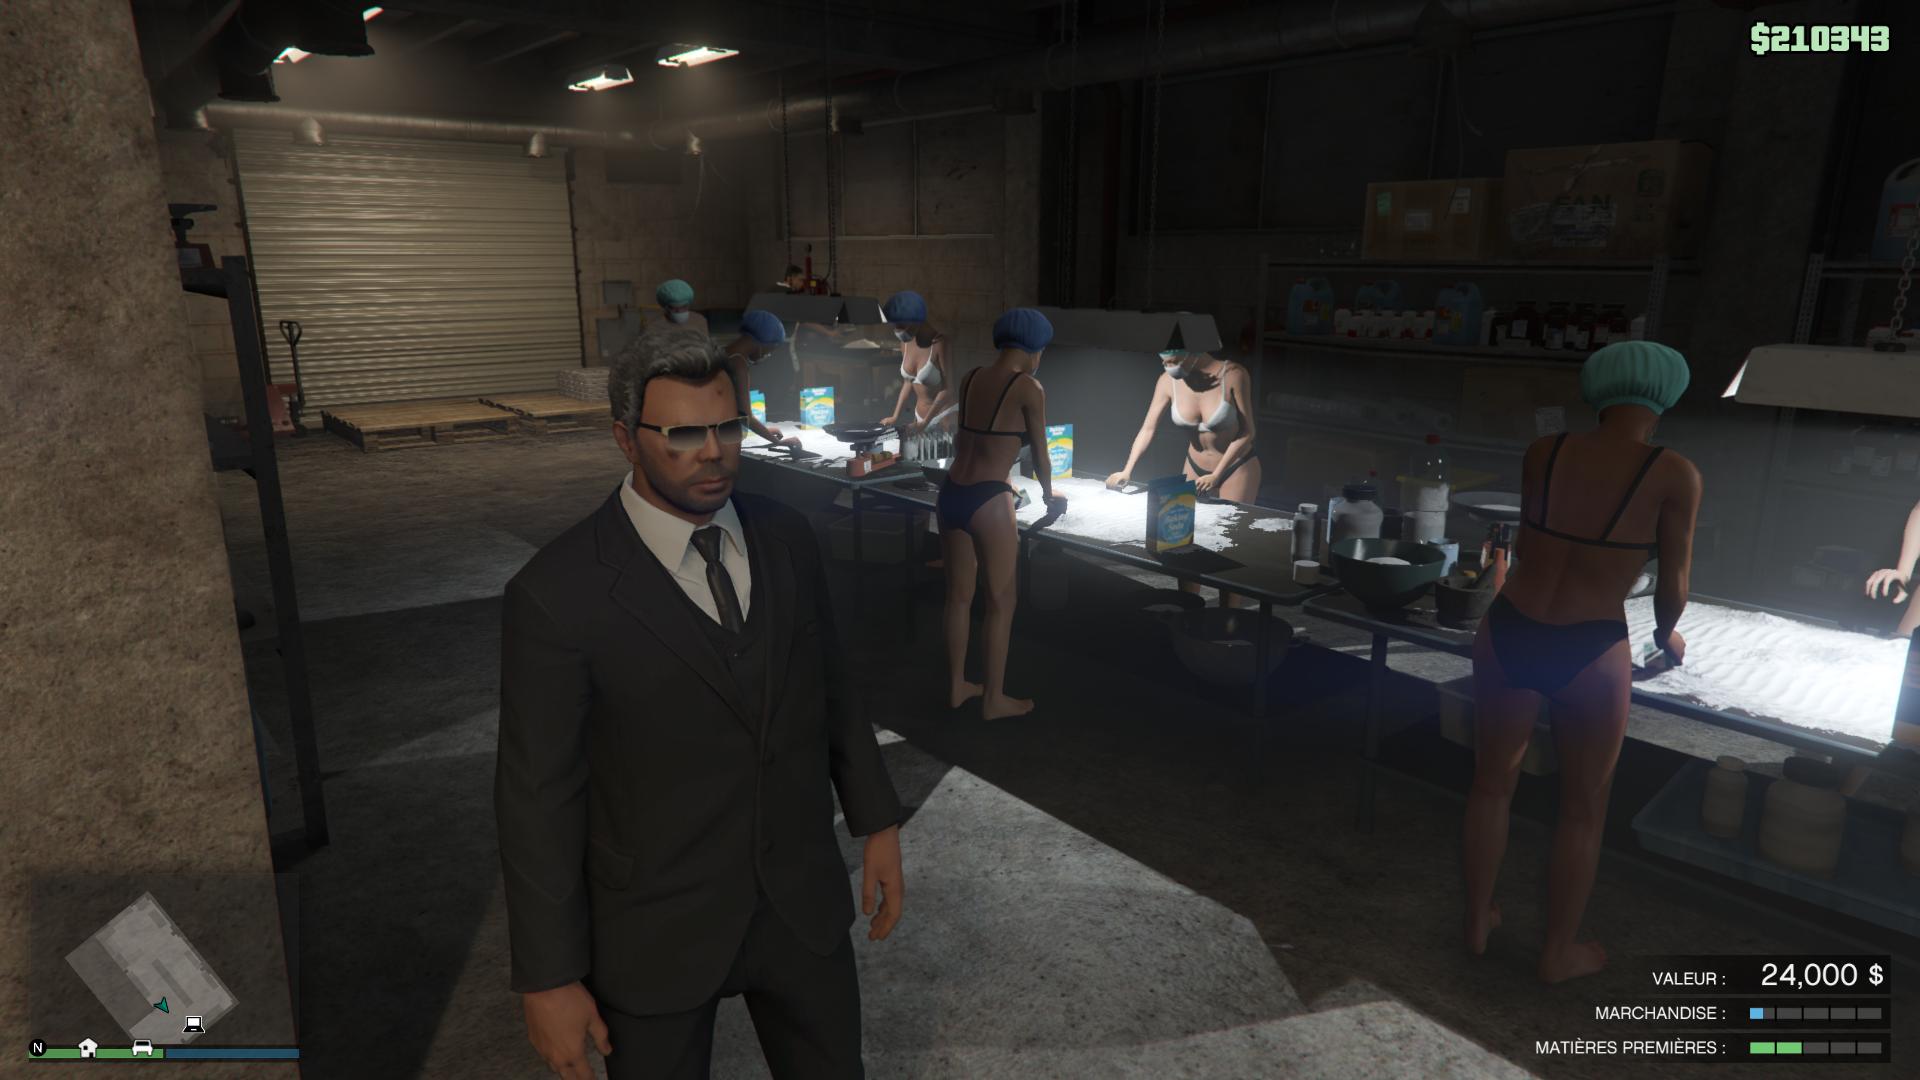 Grand Theft Auto V - Mon Trafic De Came